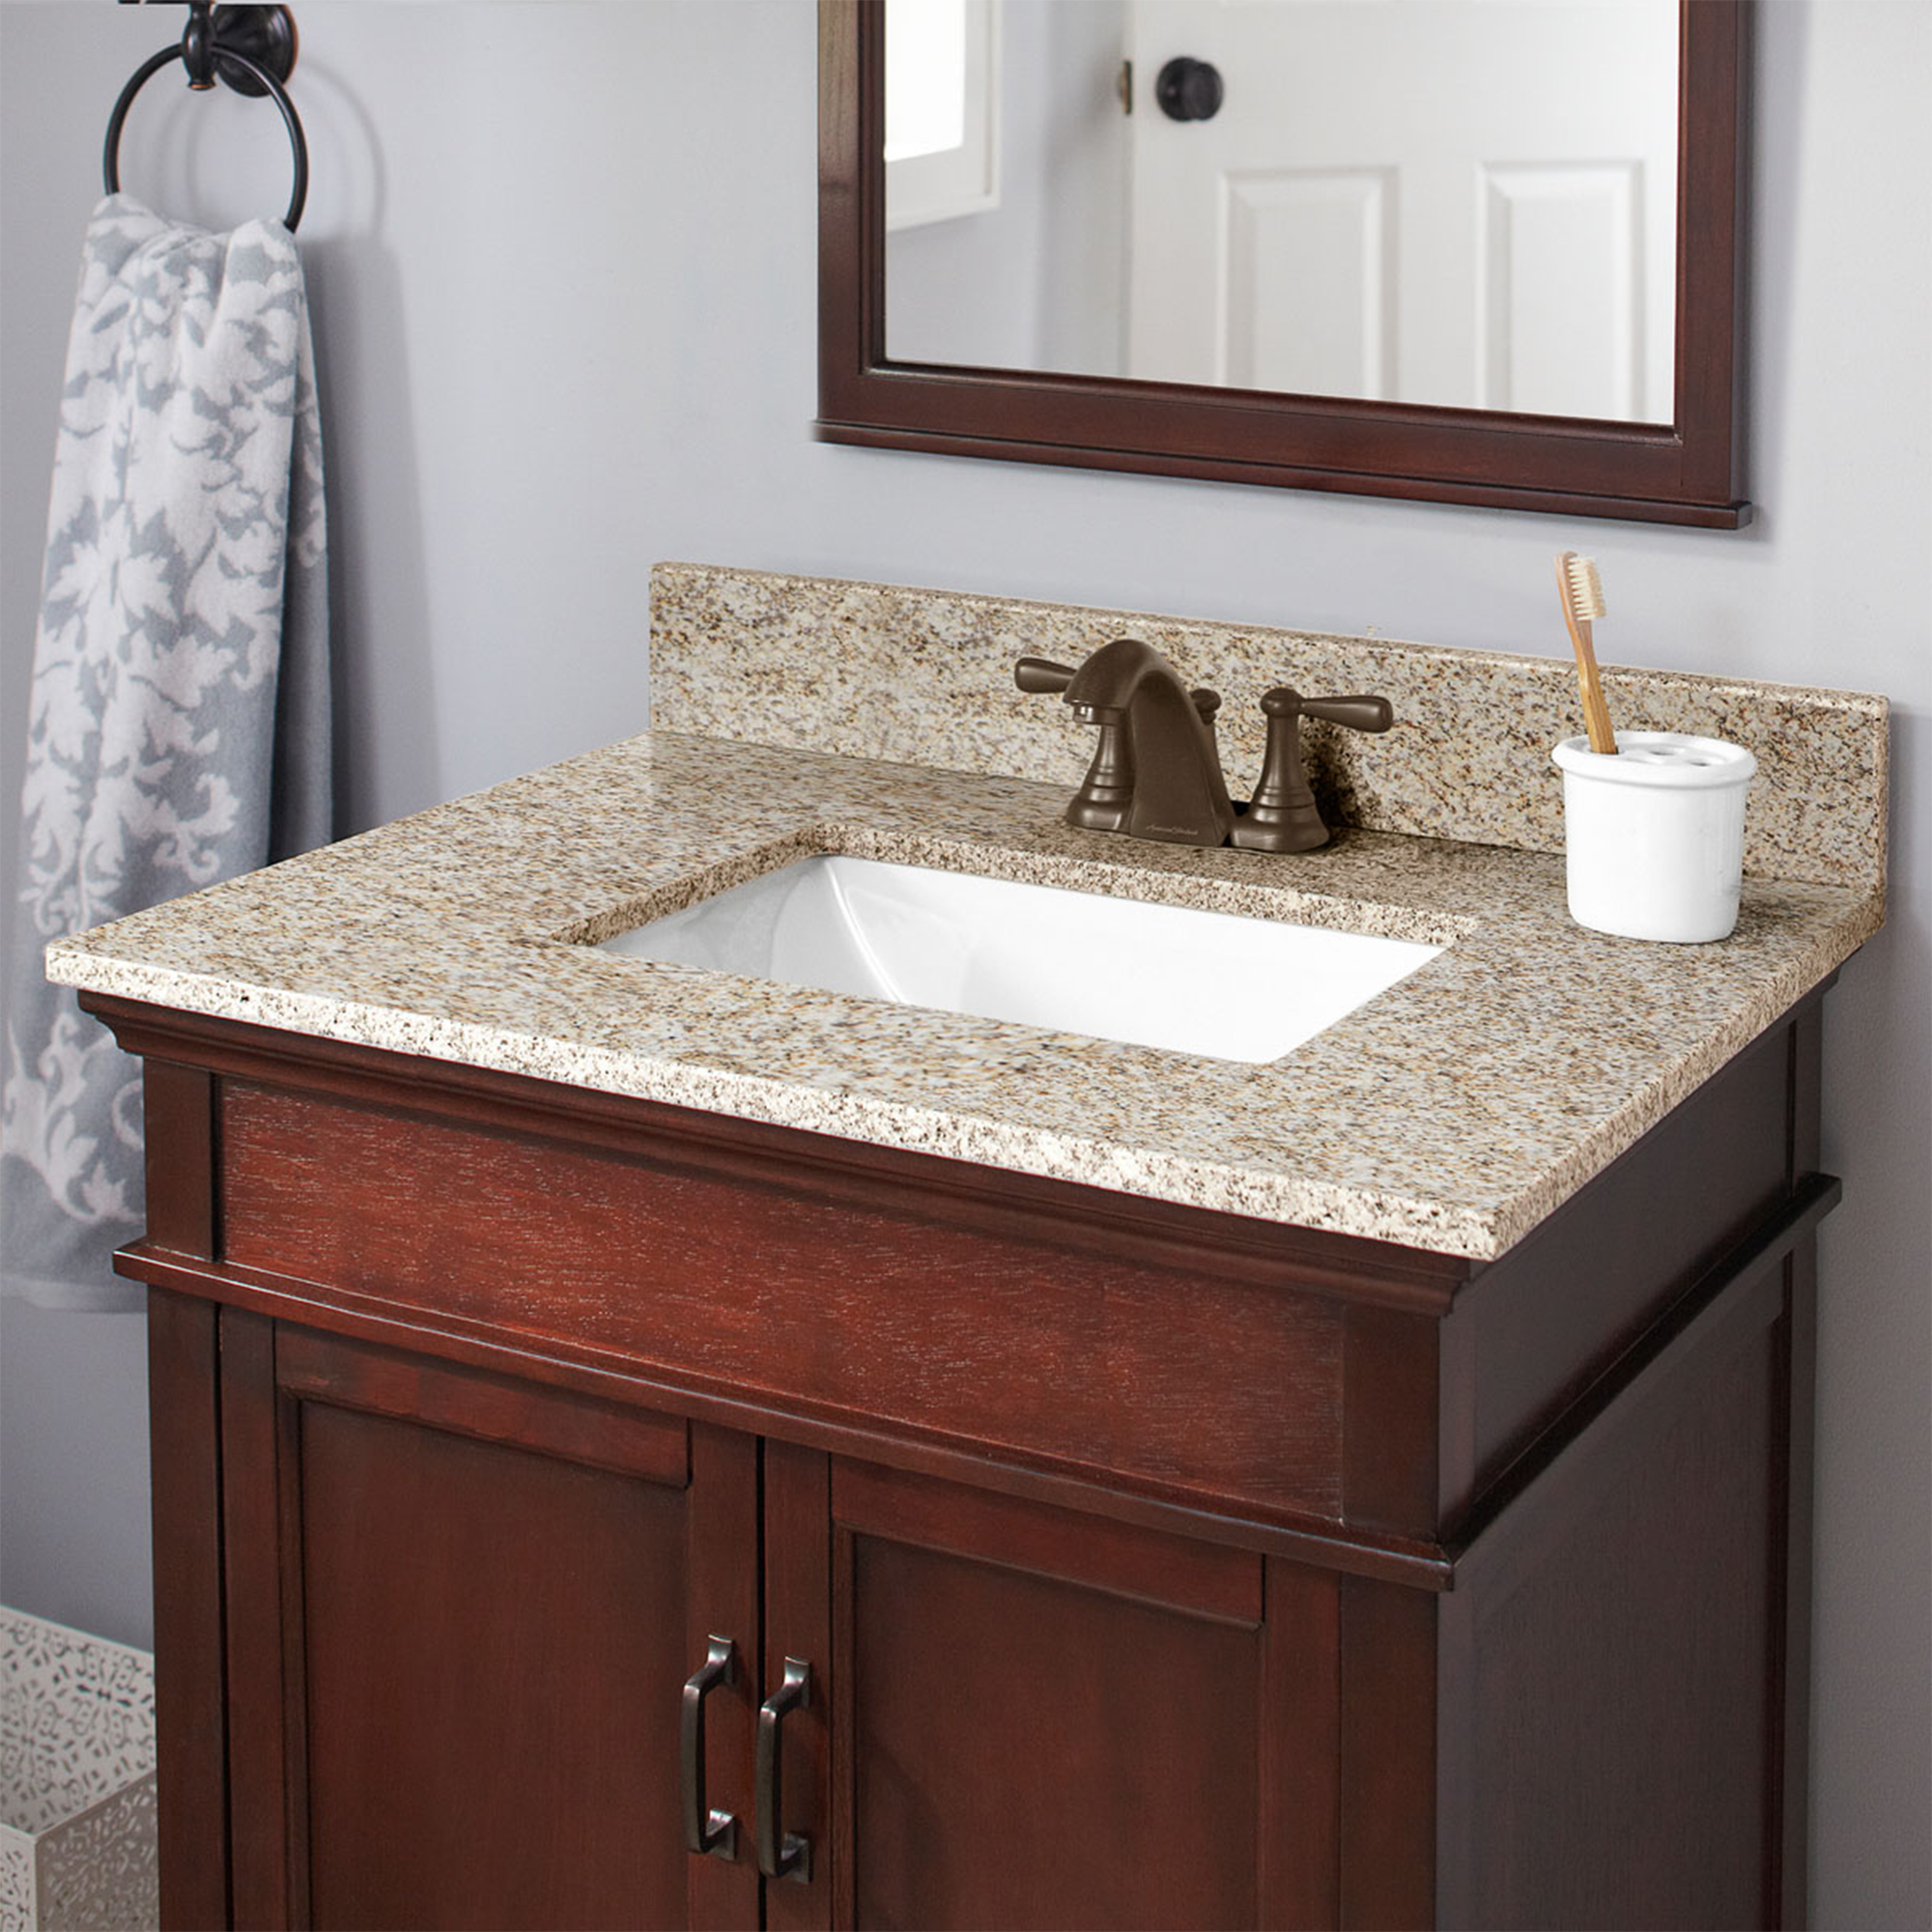 Granite Vanity Top And 4 In Spread